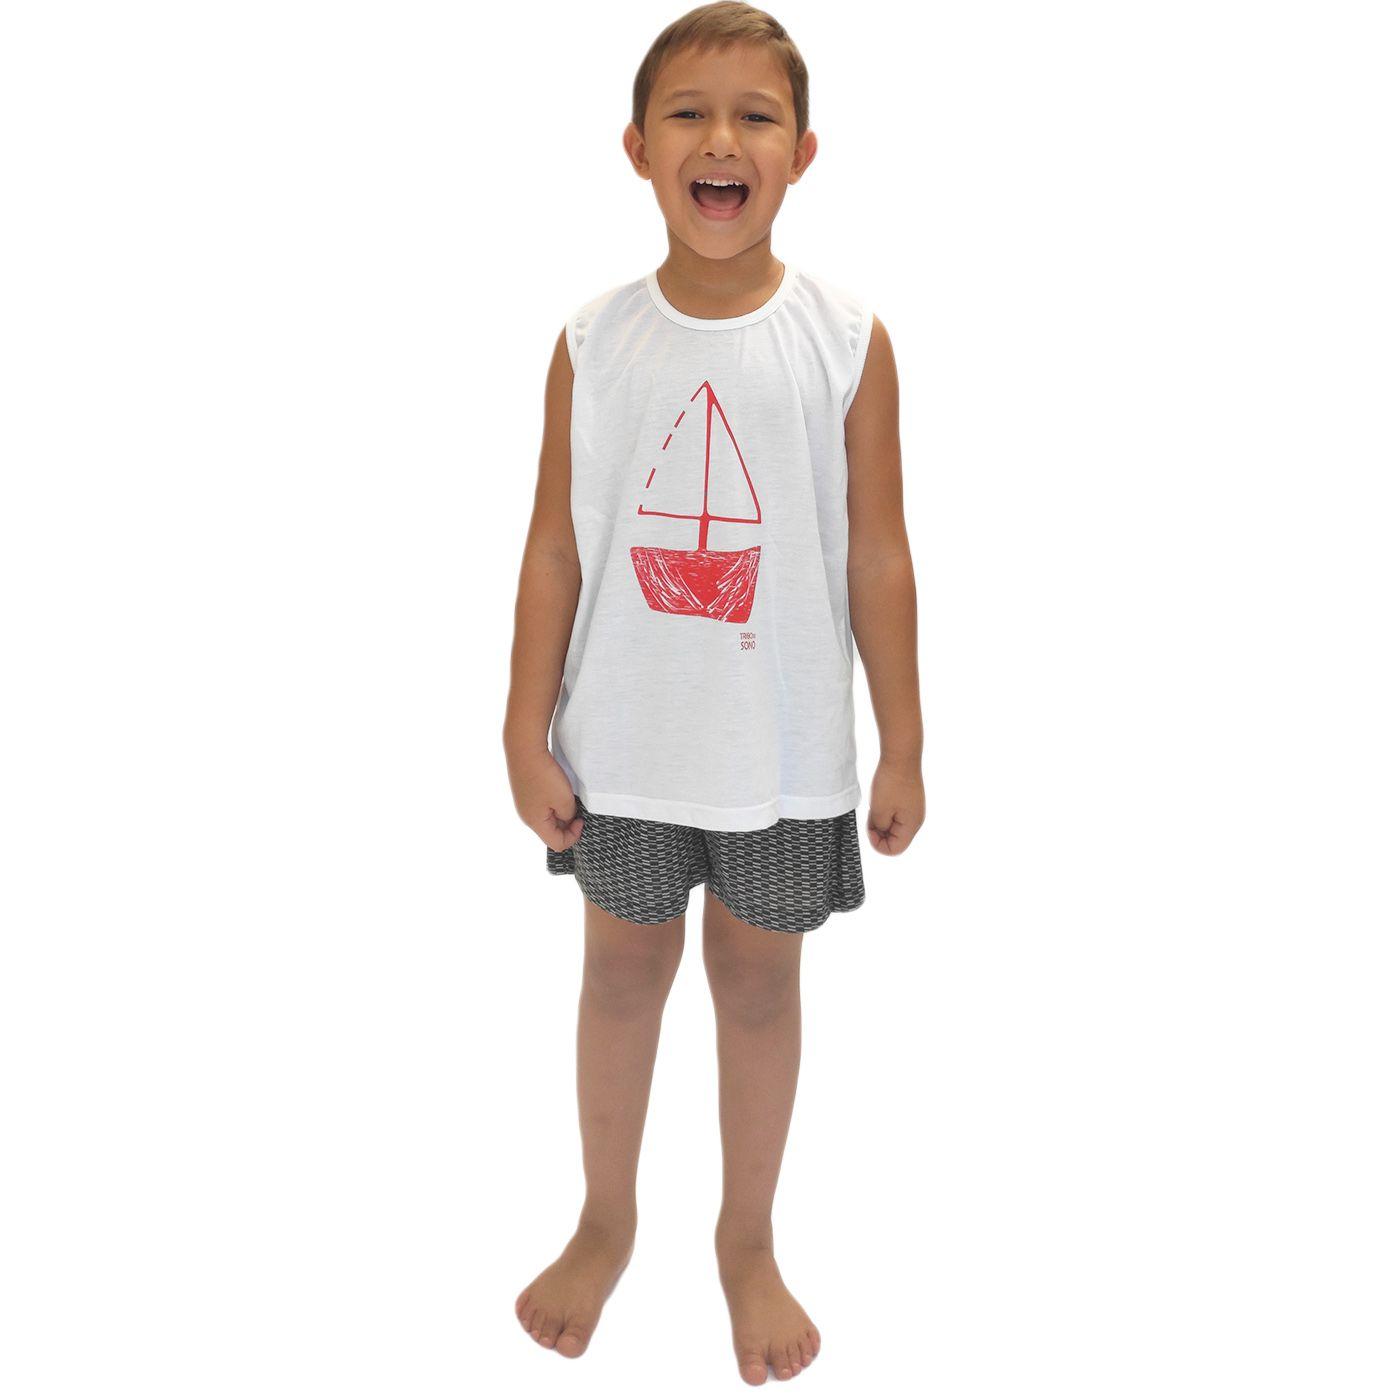 Pijama infantil menino regata barco